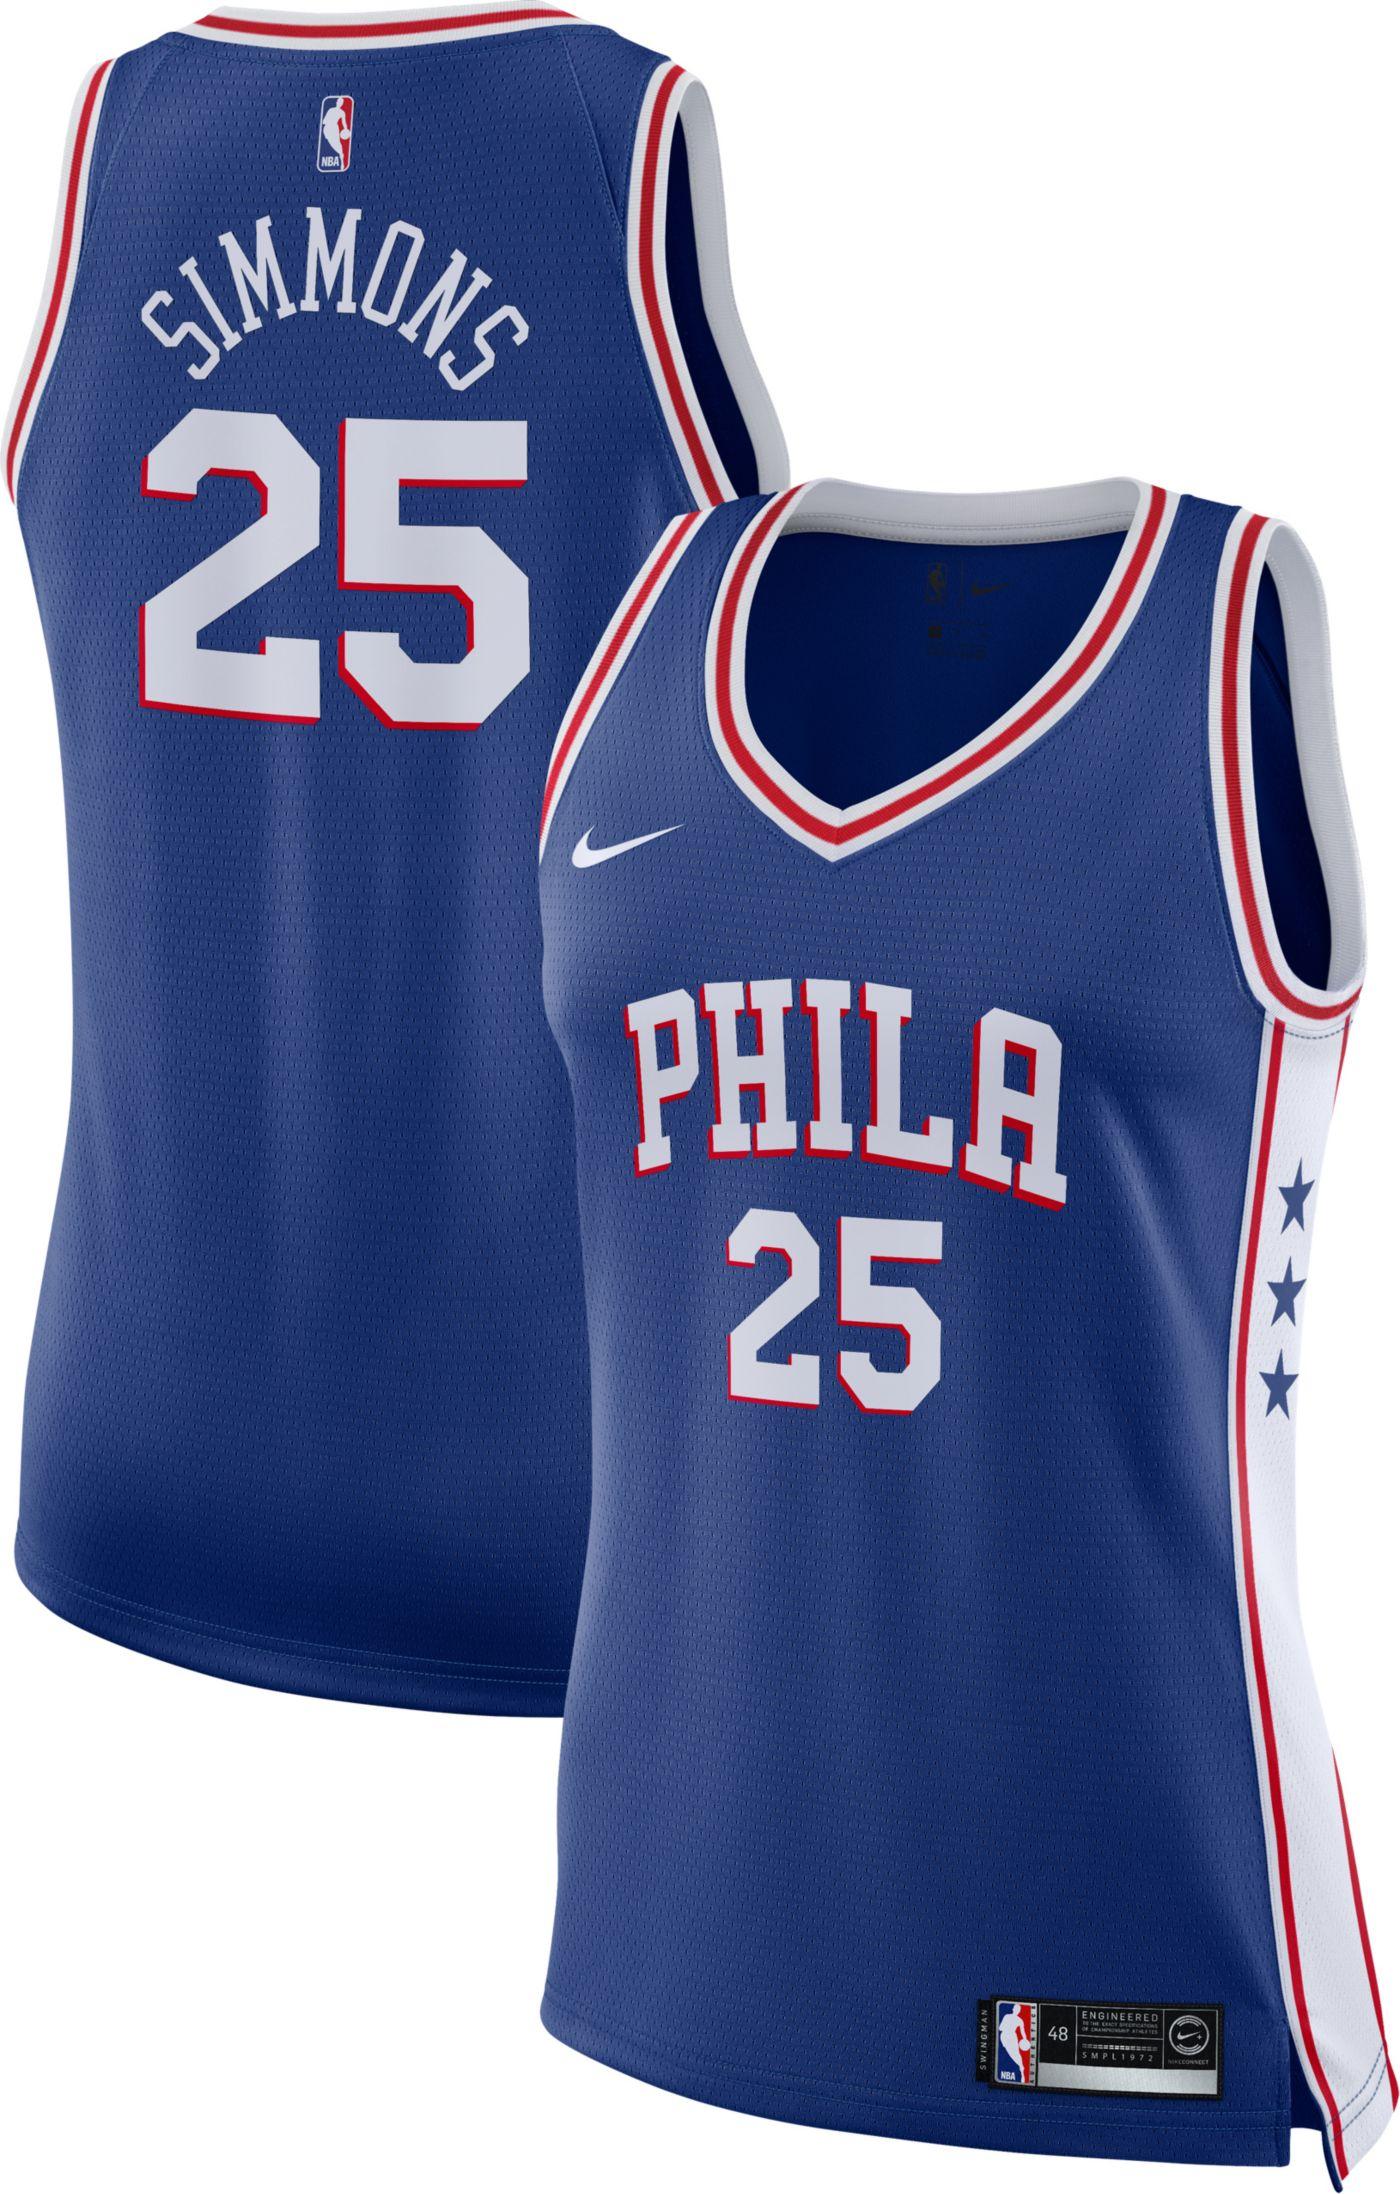 Nike Women's Philadelphia 76ers Ben Simmons #25 Royal Dri-FIT Swingman Jersey